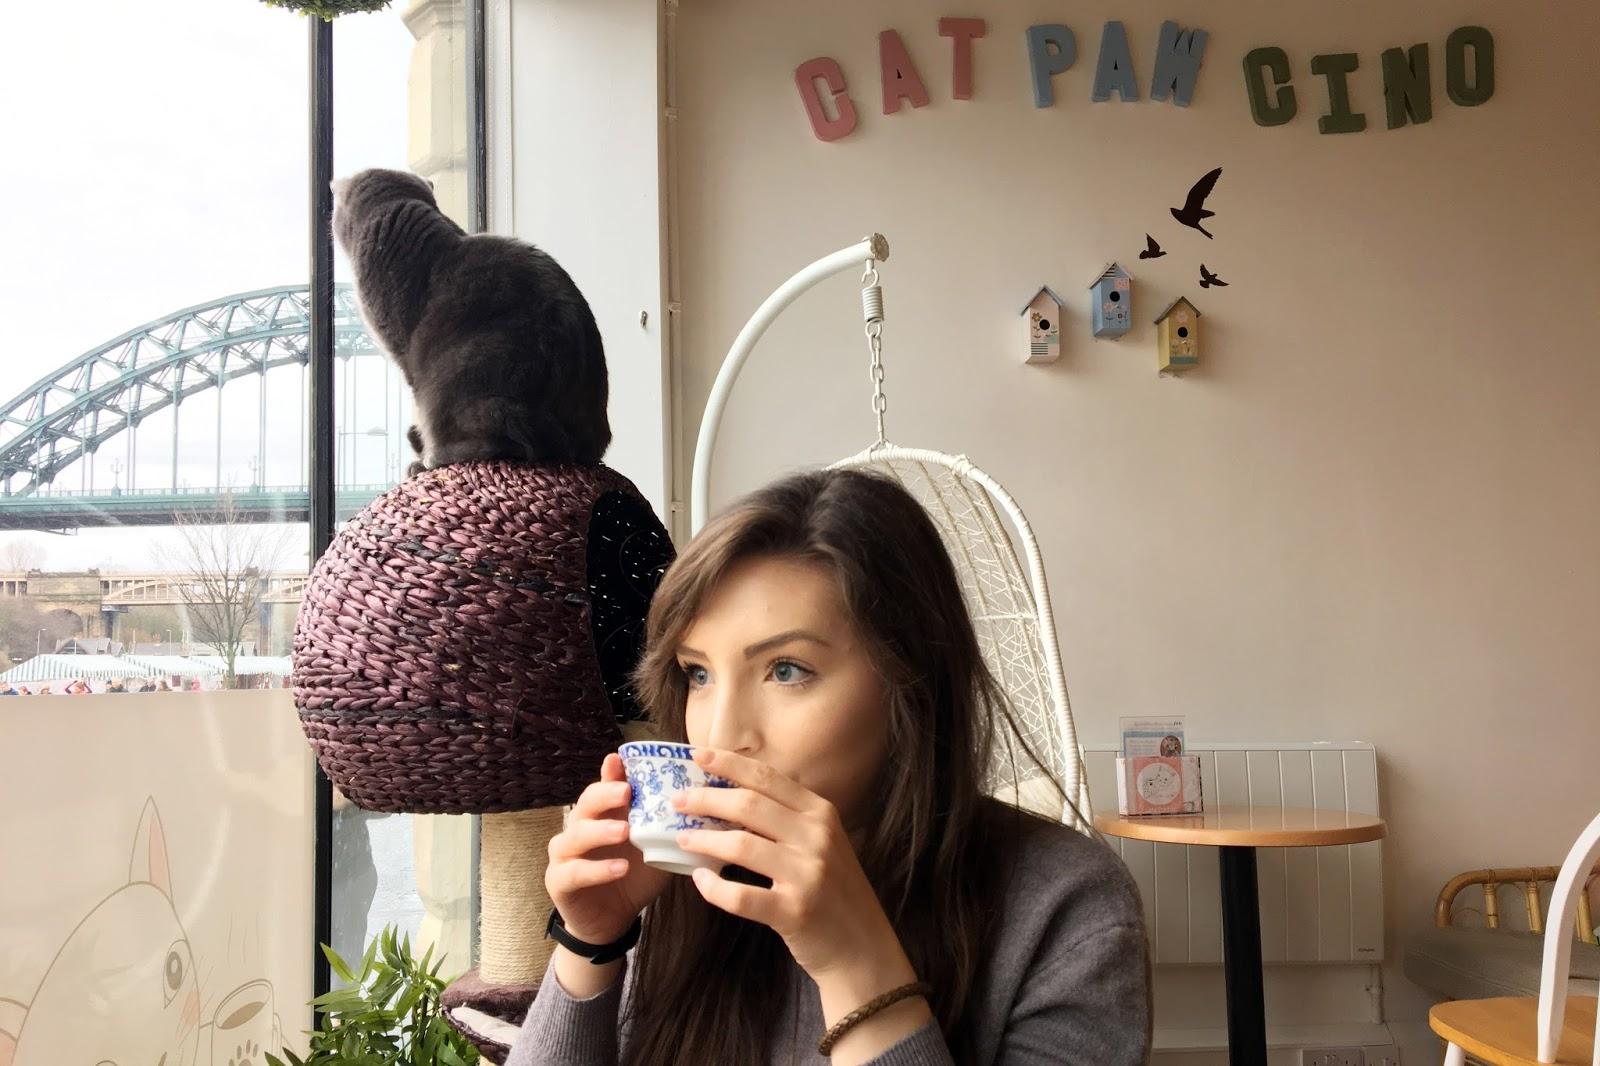 Helo Freckles Catpawcino Cat Cafe Newcastle Quayside nebloggers